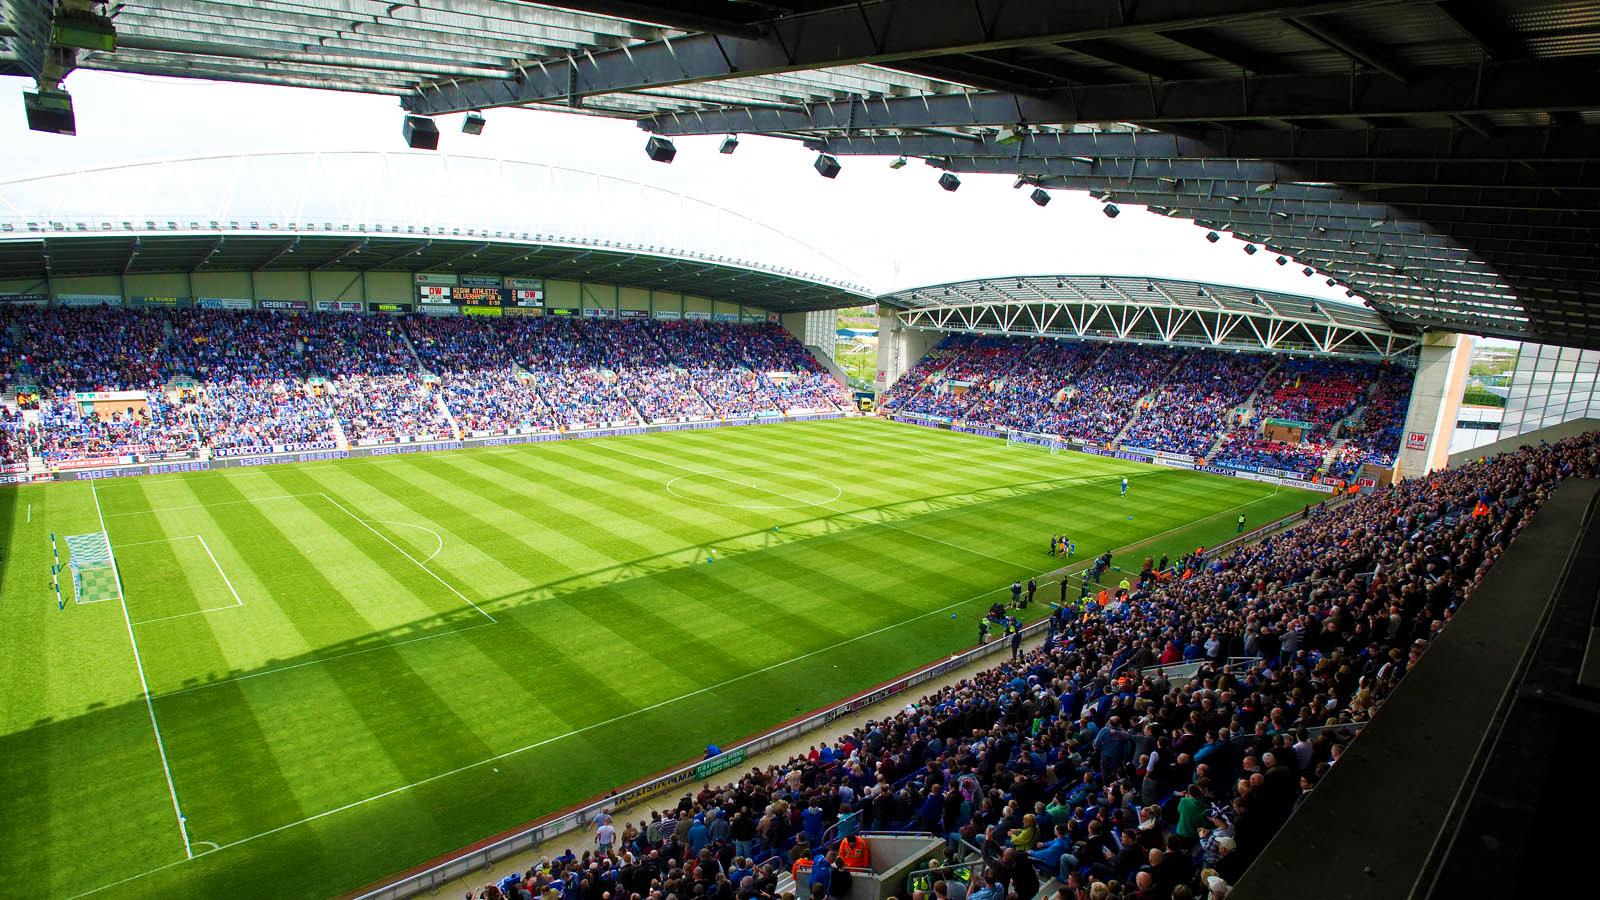 Ukuran Lapangan Sepak Bola Internasional Fifa Gambar